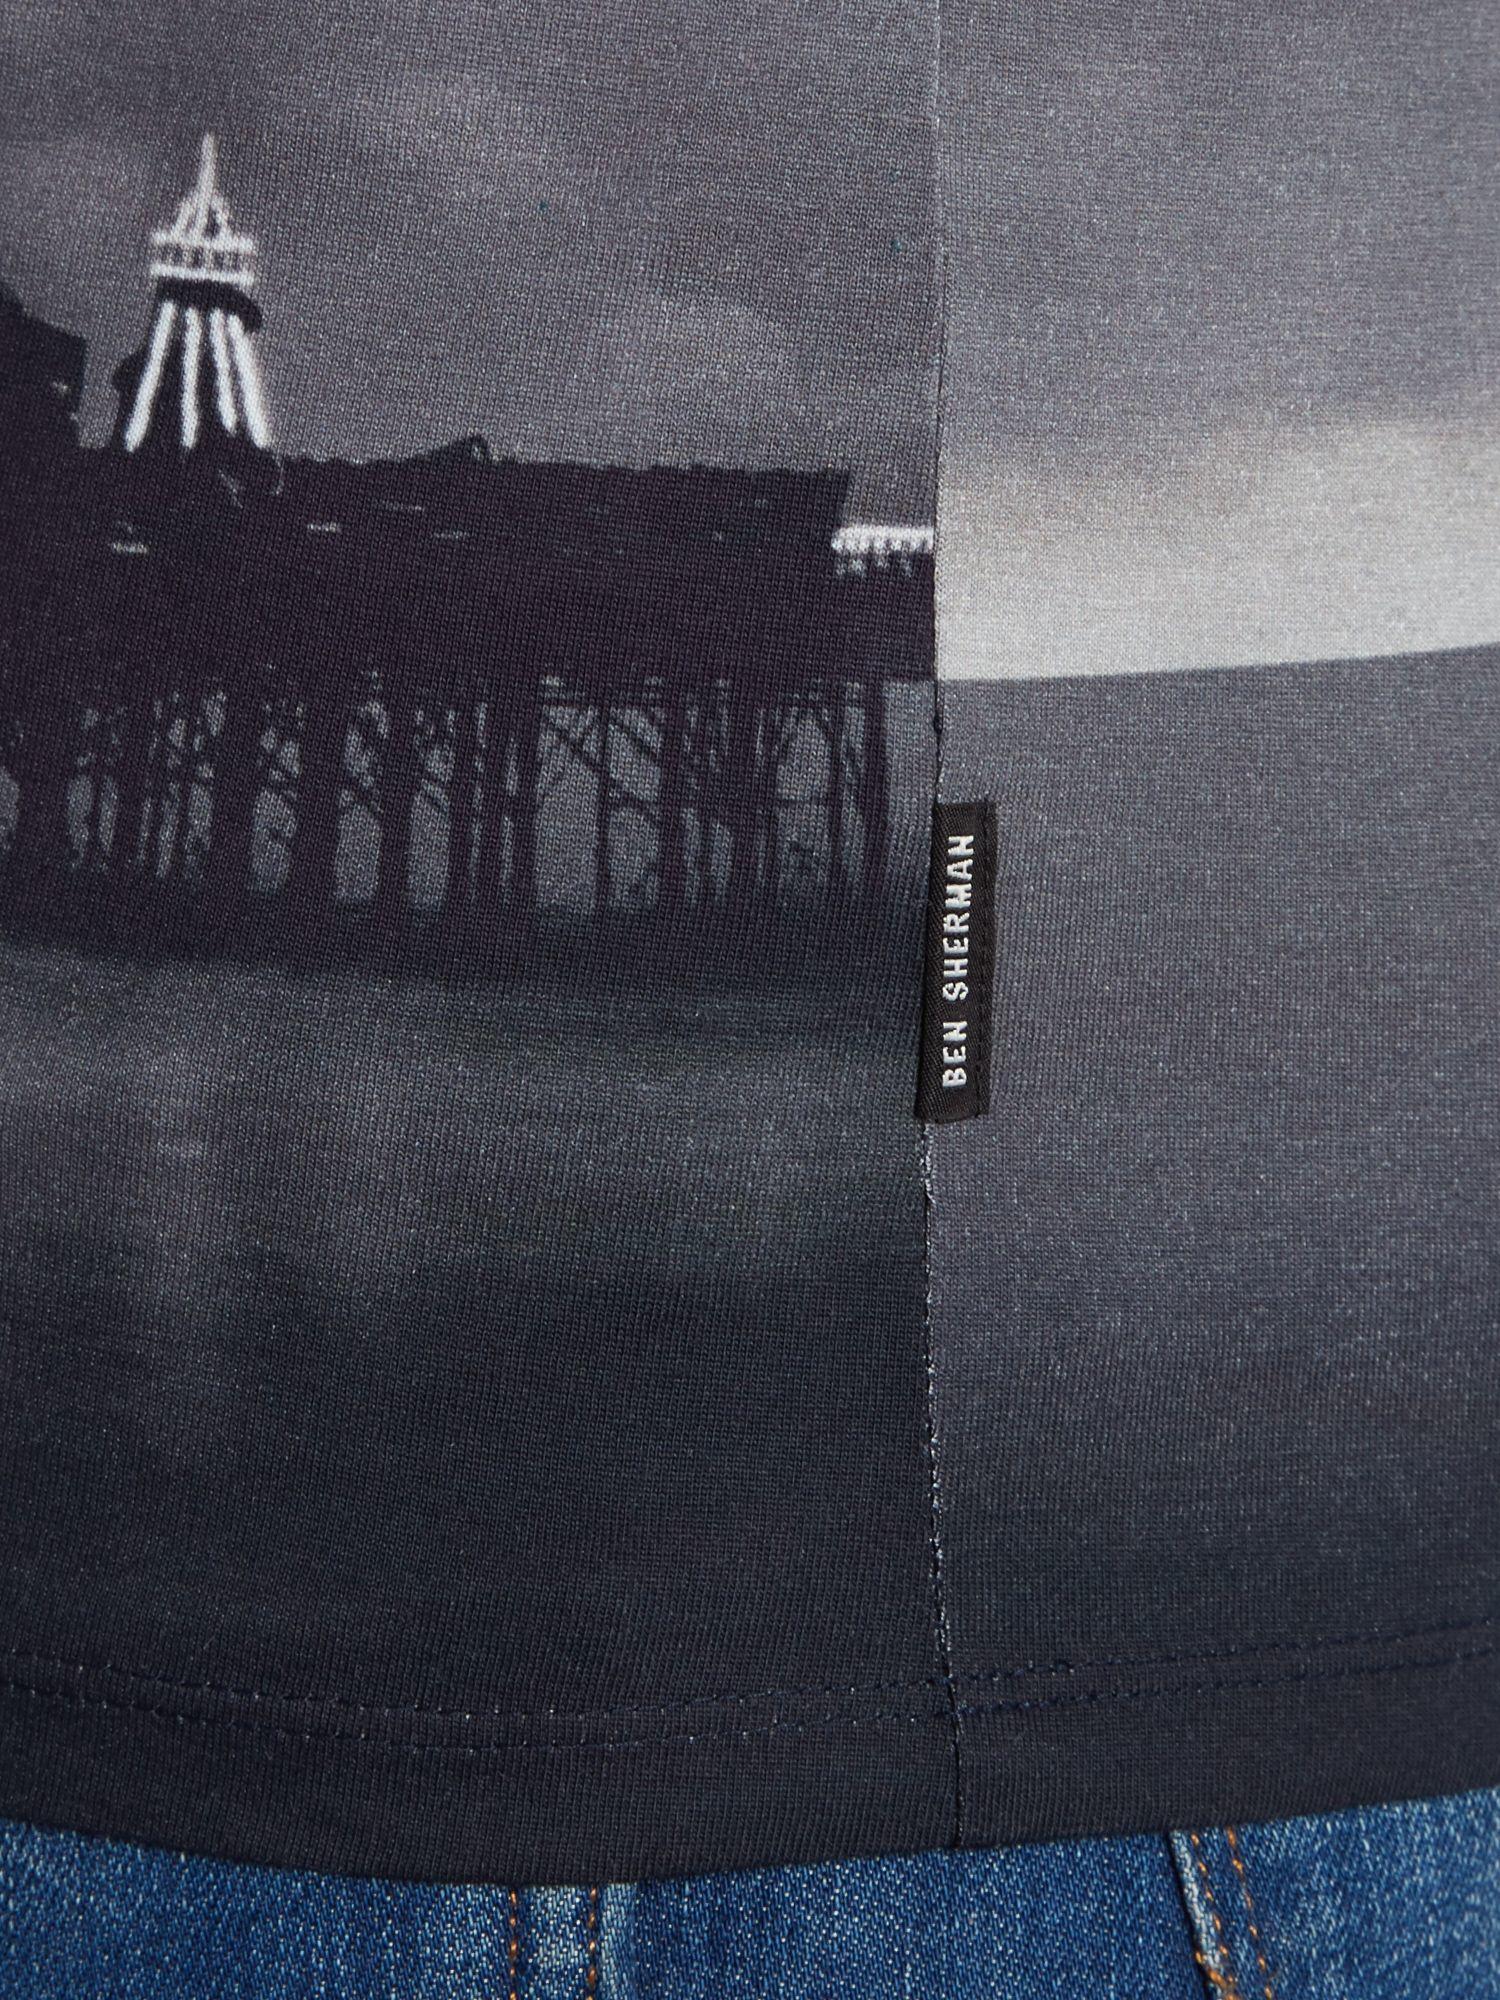 Lyst ben sherman brighton cloud print t shirt in black for Brighton t shirt printing